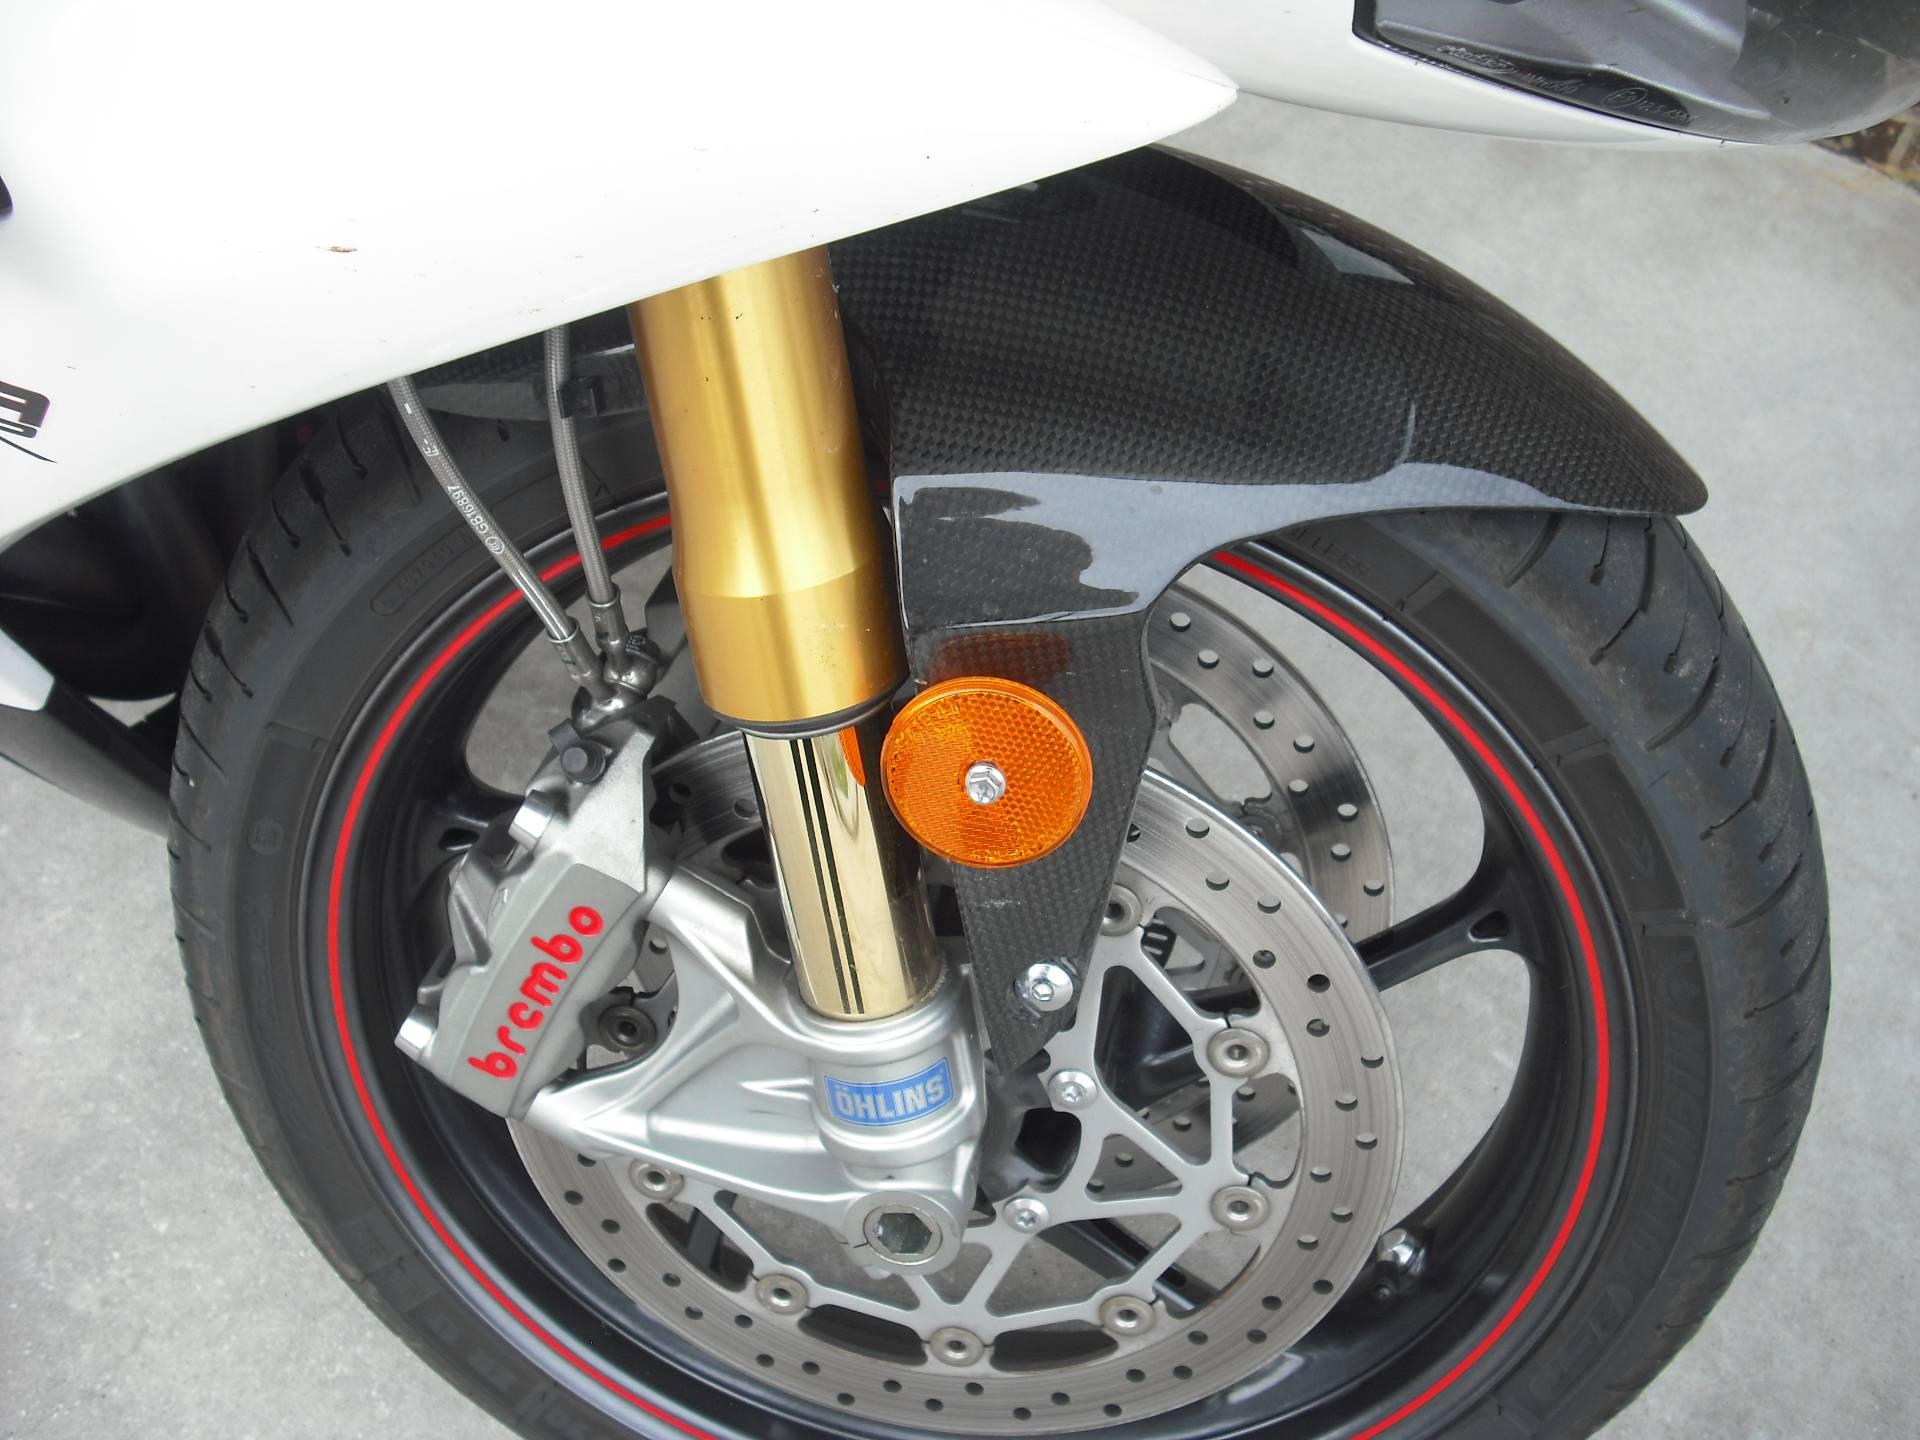 new 2013 triumph daytona 675r motorcycles in fayetteville, ga